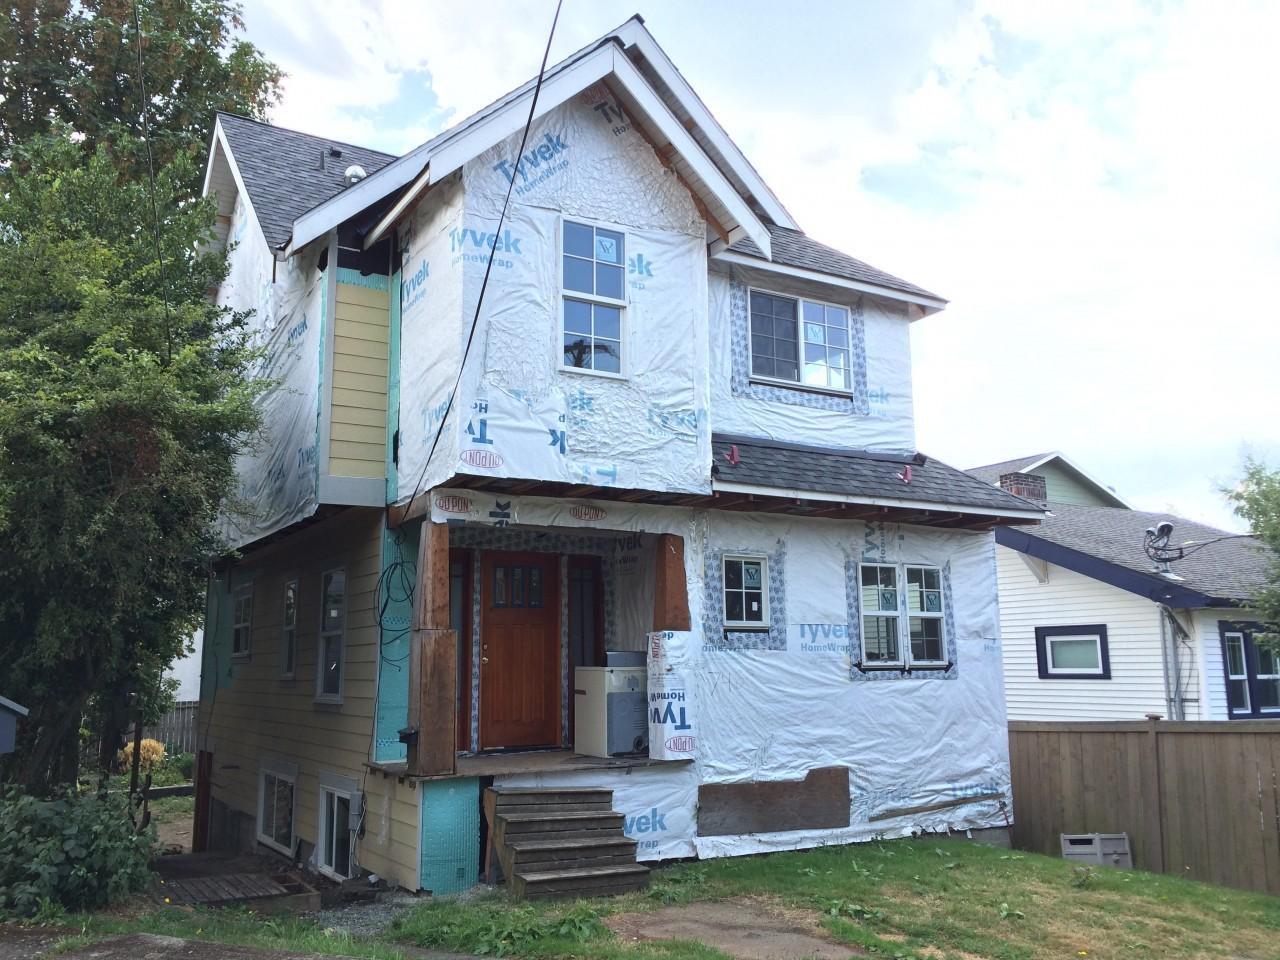 House covered in Tyvek